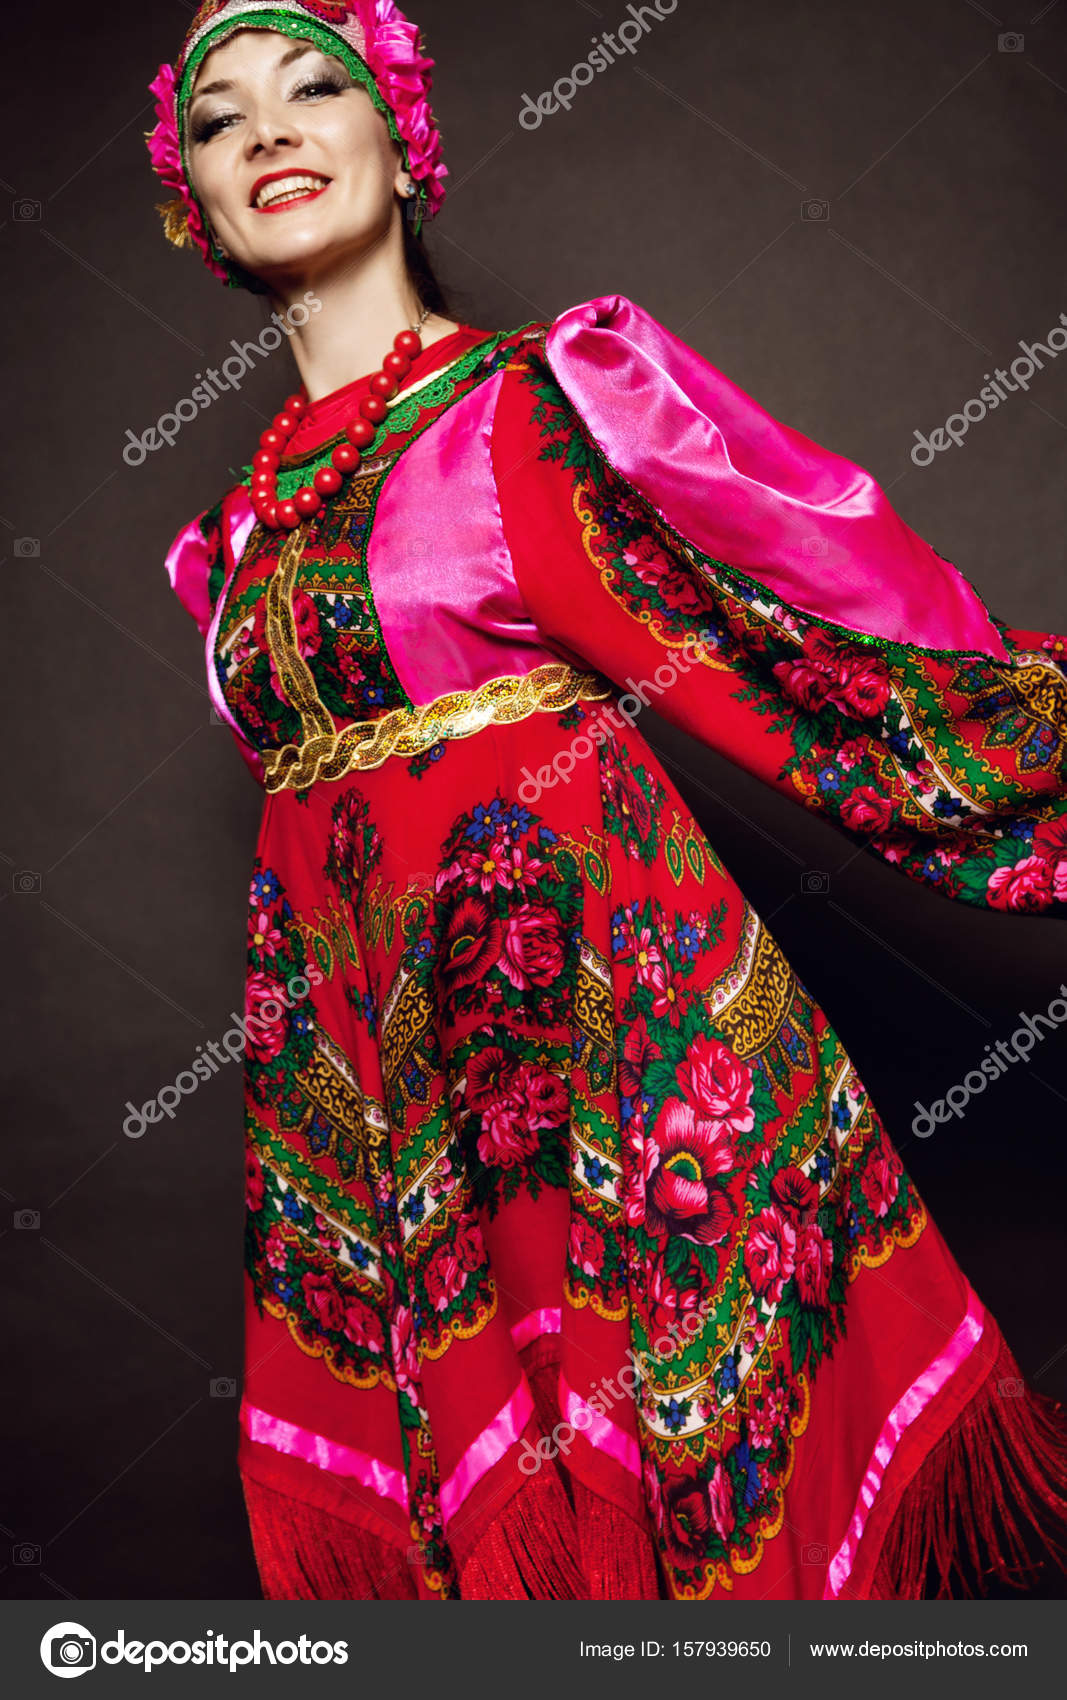 Folklorique Femme Femme Femme Russe Folklorique Costume Russe Folklorique Costume Russe Costume Costume Folklorique nOw0Pk8